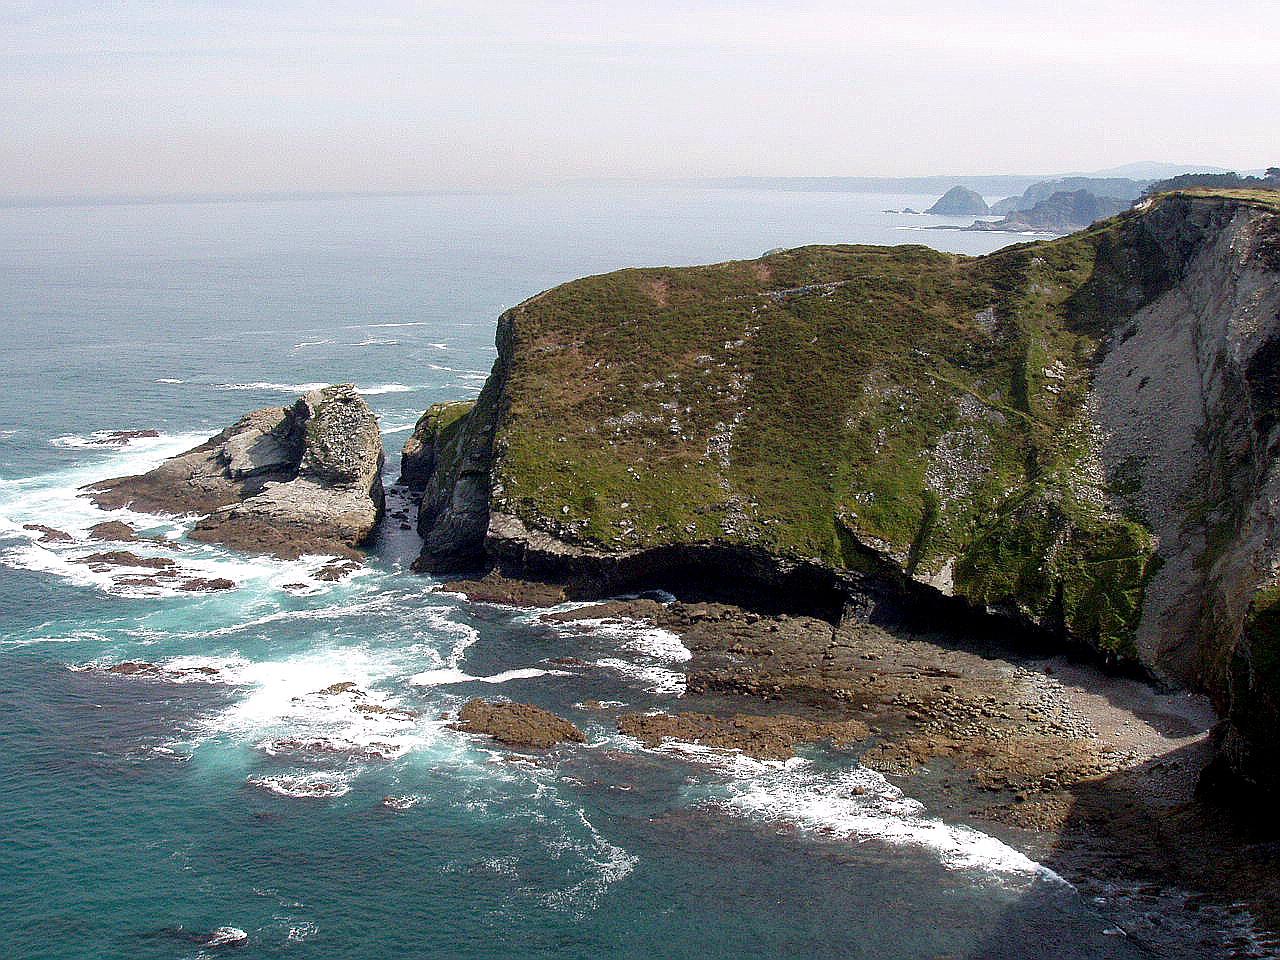 Foto playa Puerto Chico. Cabo Vidio, Cudillero, Asturias